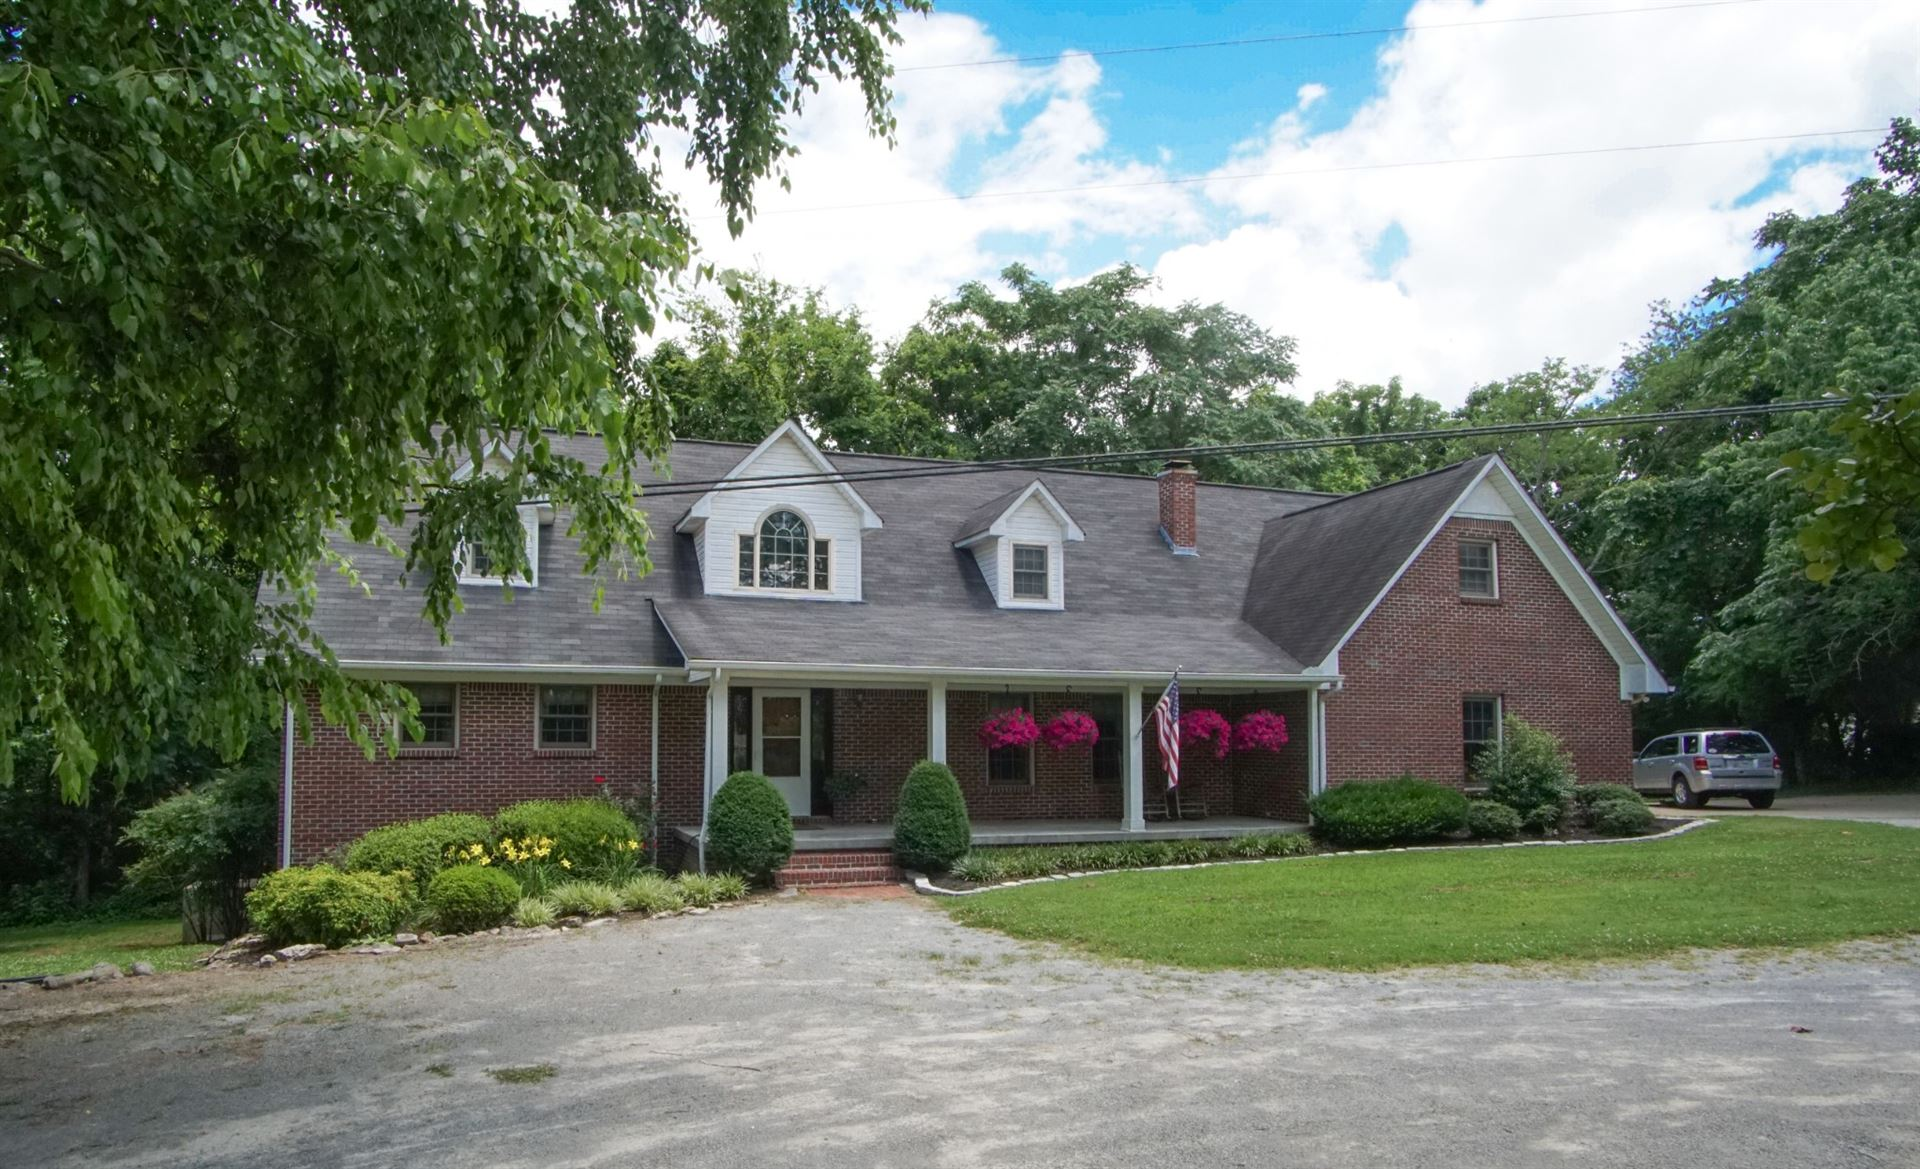 27 Orchard Hill Rd, Fayetteville, TN 37334 - MLS#: 2269048